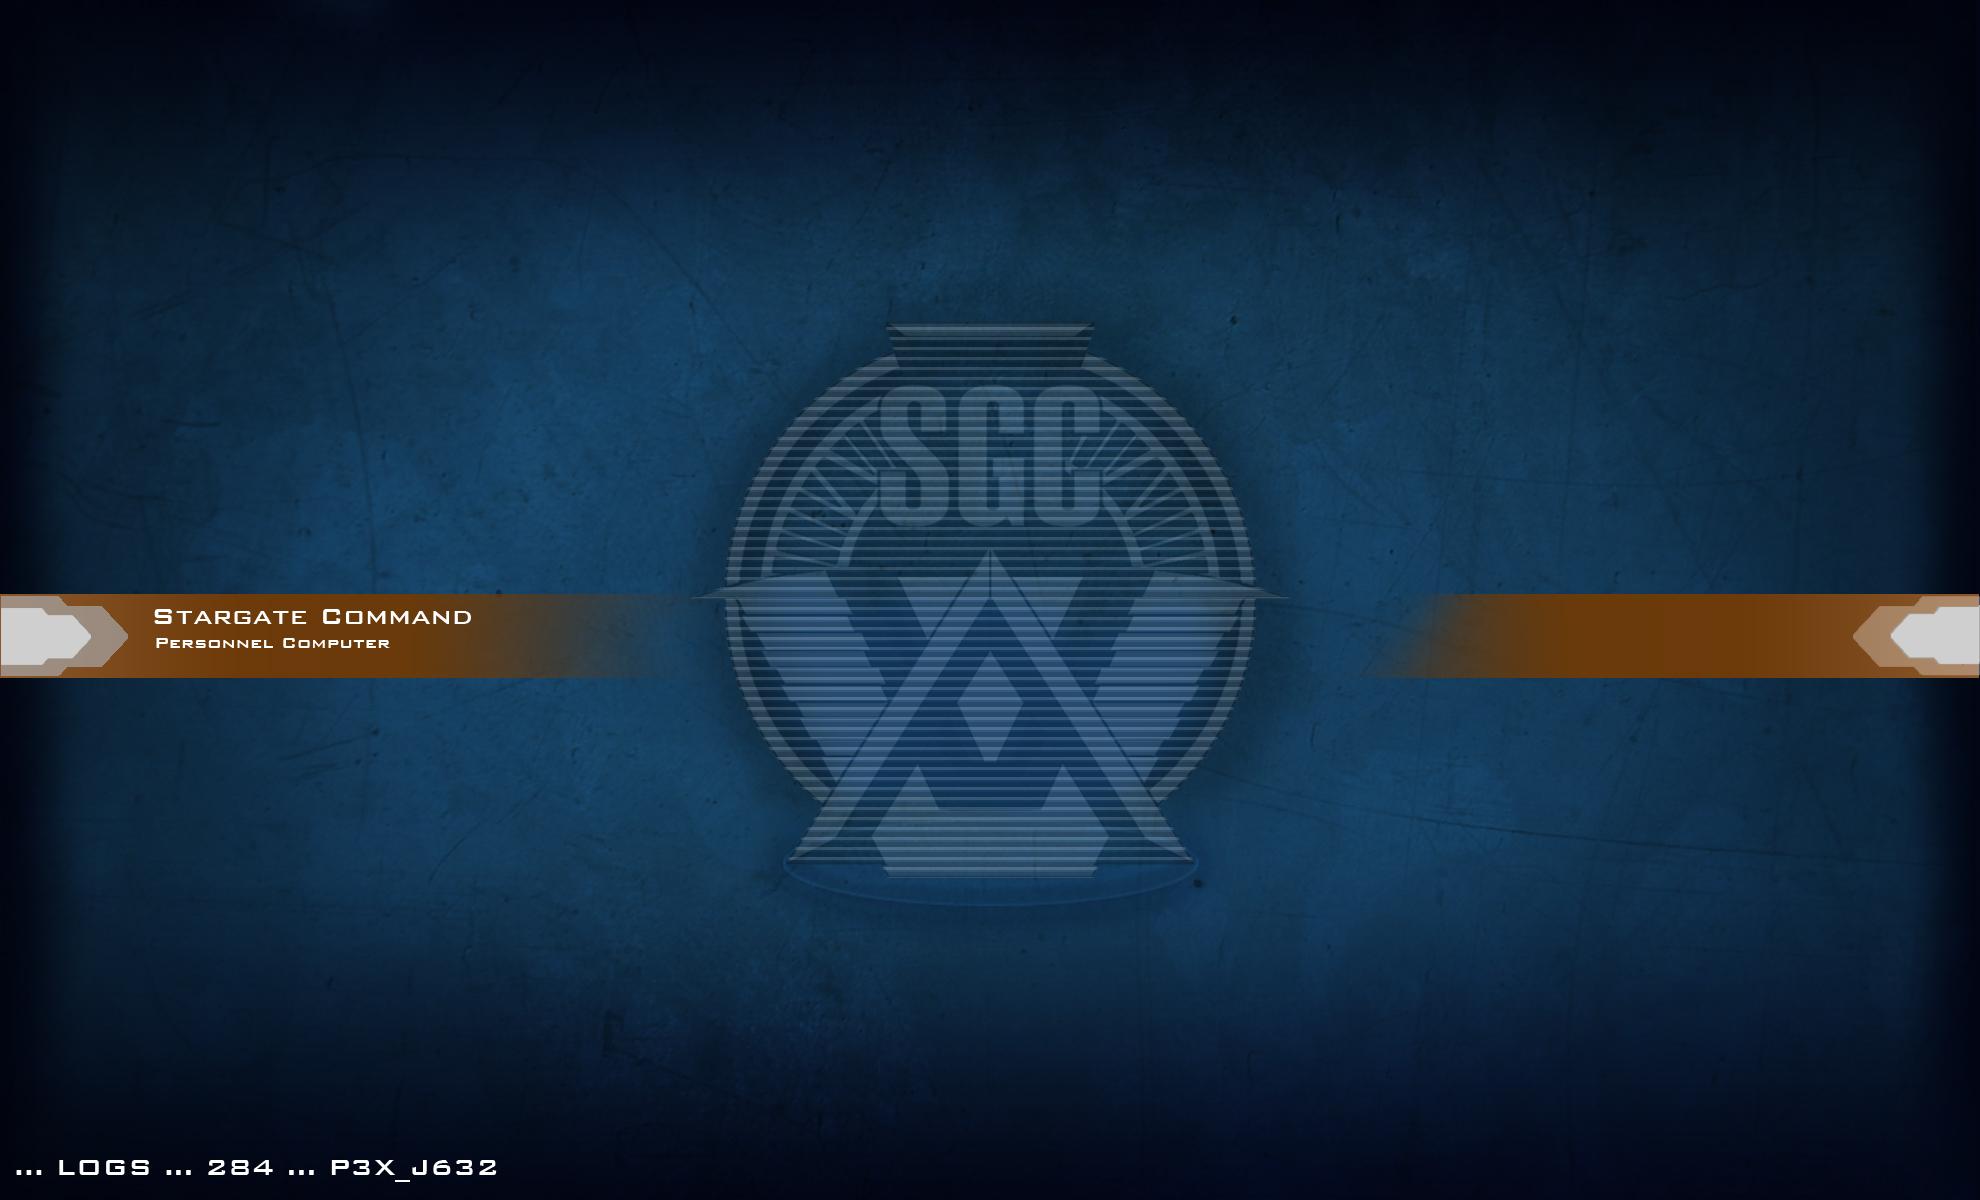 Sgc Desktop Wallpaper By Magestic Lantian On Deviantart